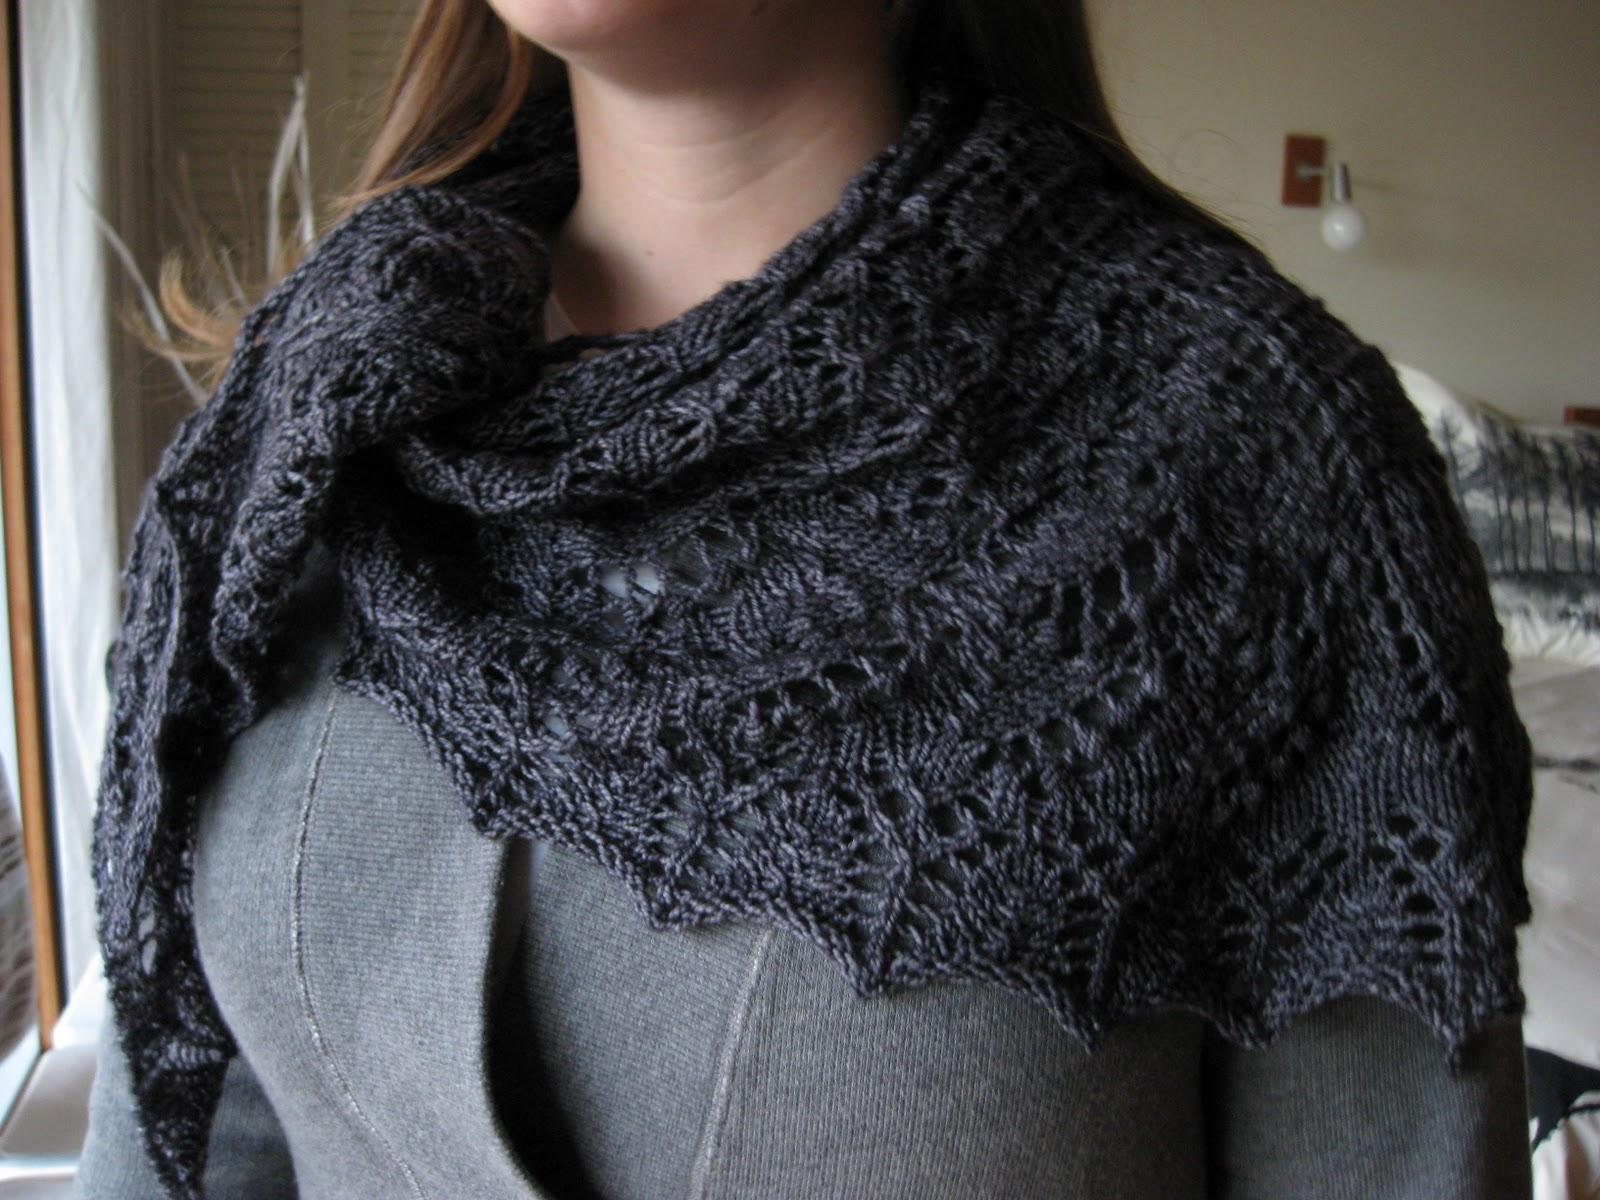 Knitting Pipeline: Episode 23 Shawl Style